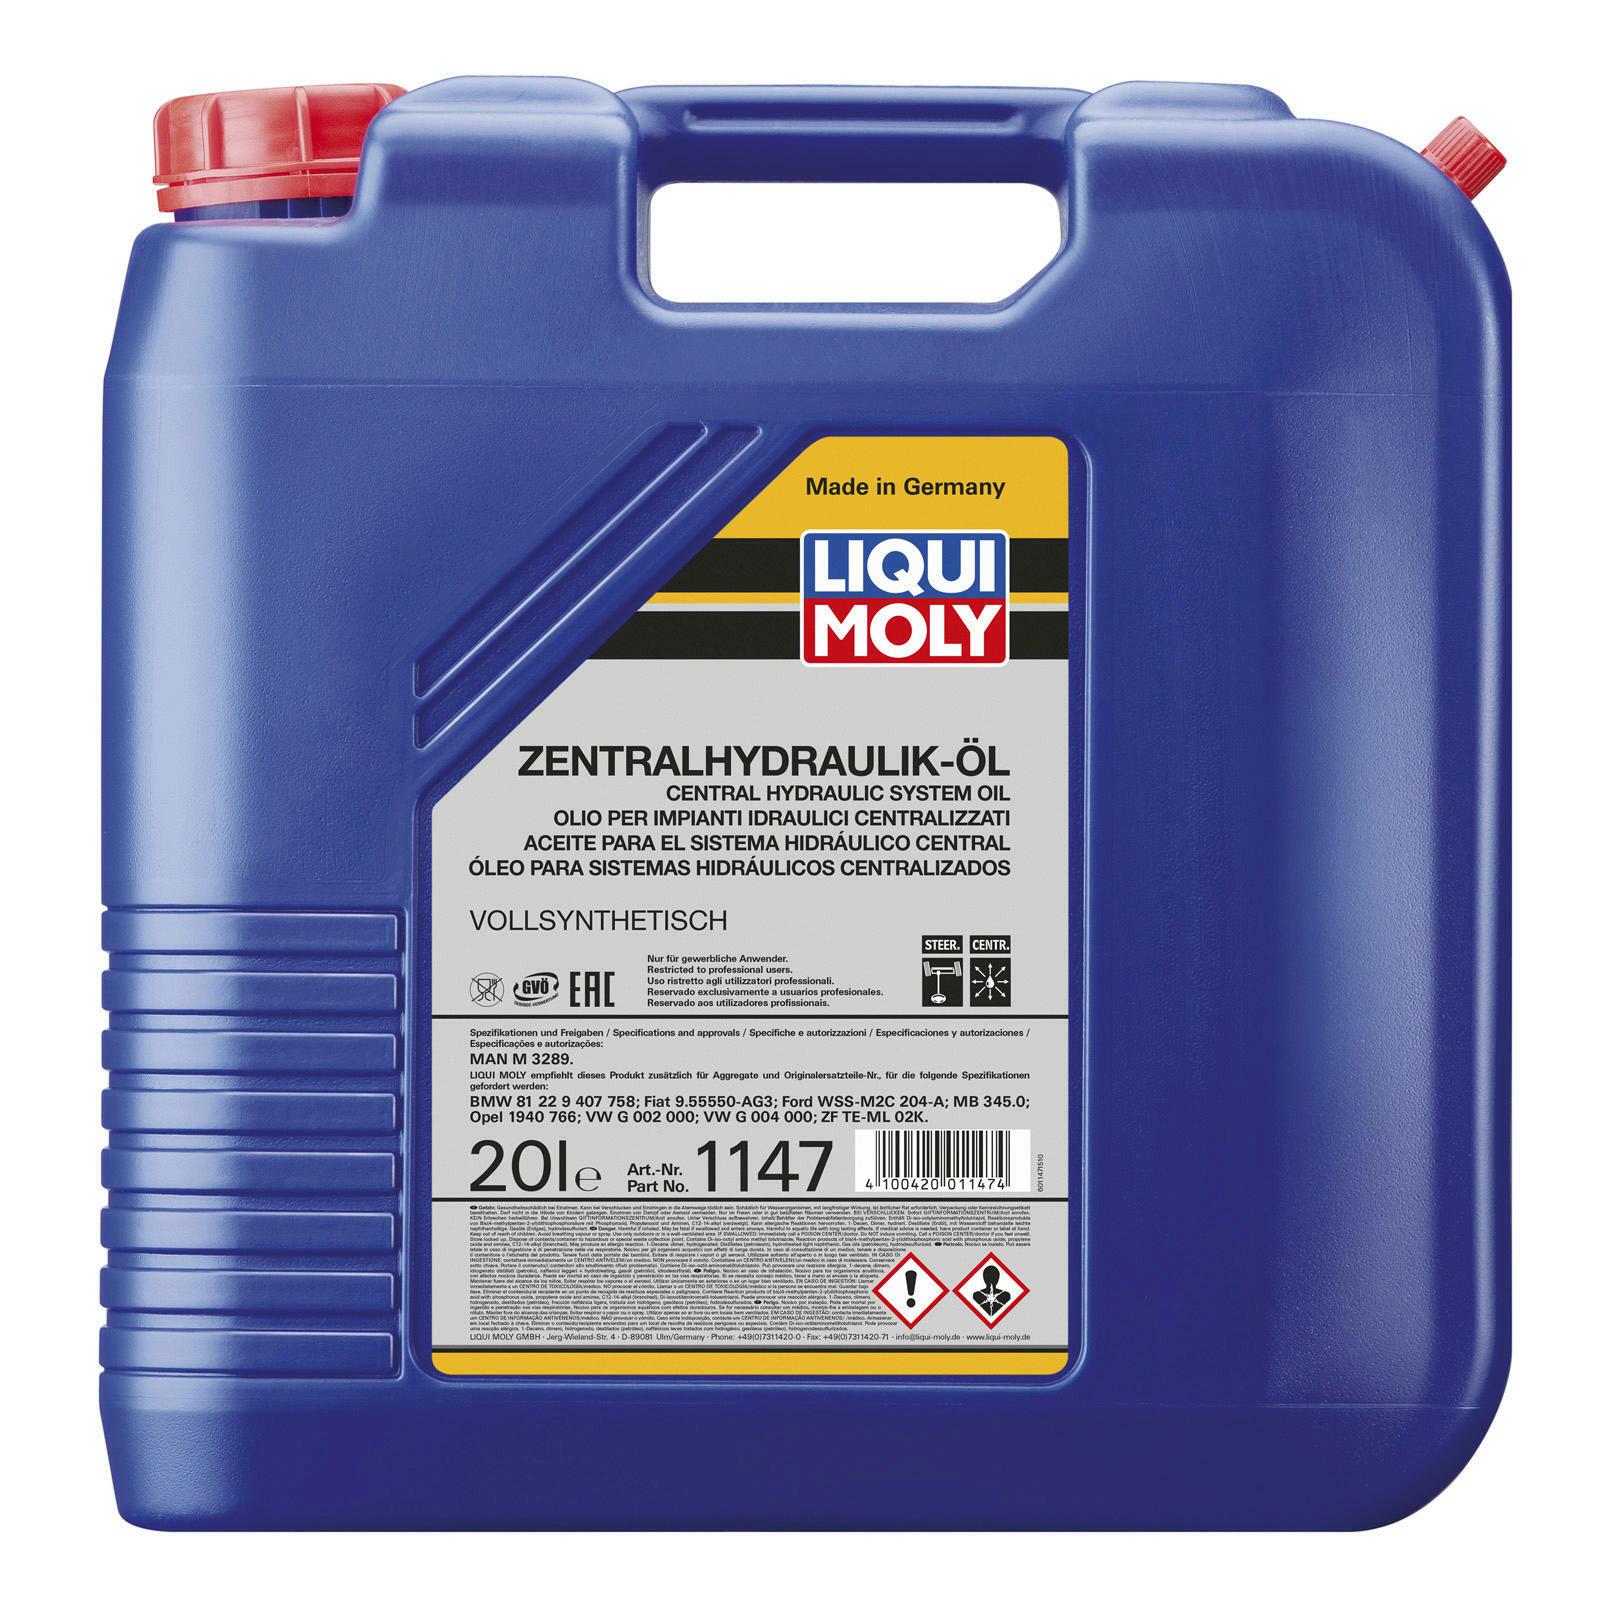 Liqui Moly Zentralhydrauliköl 20L